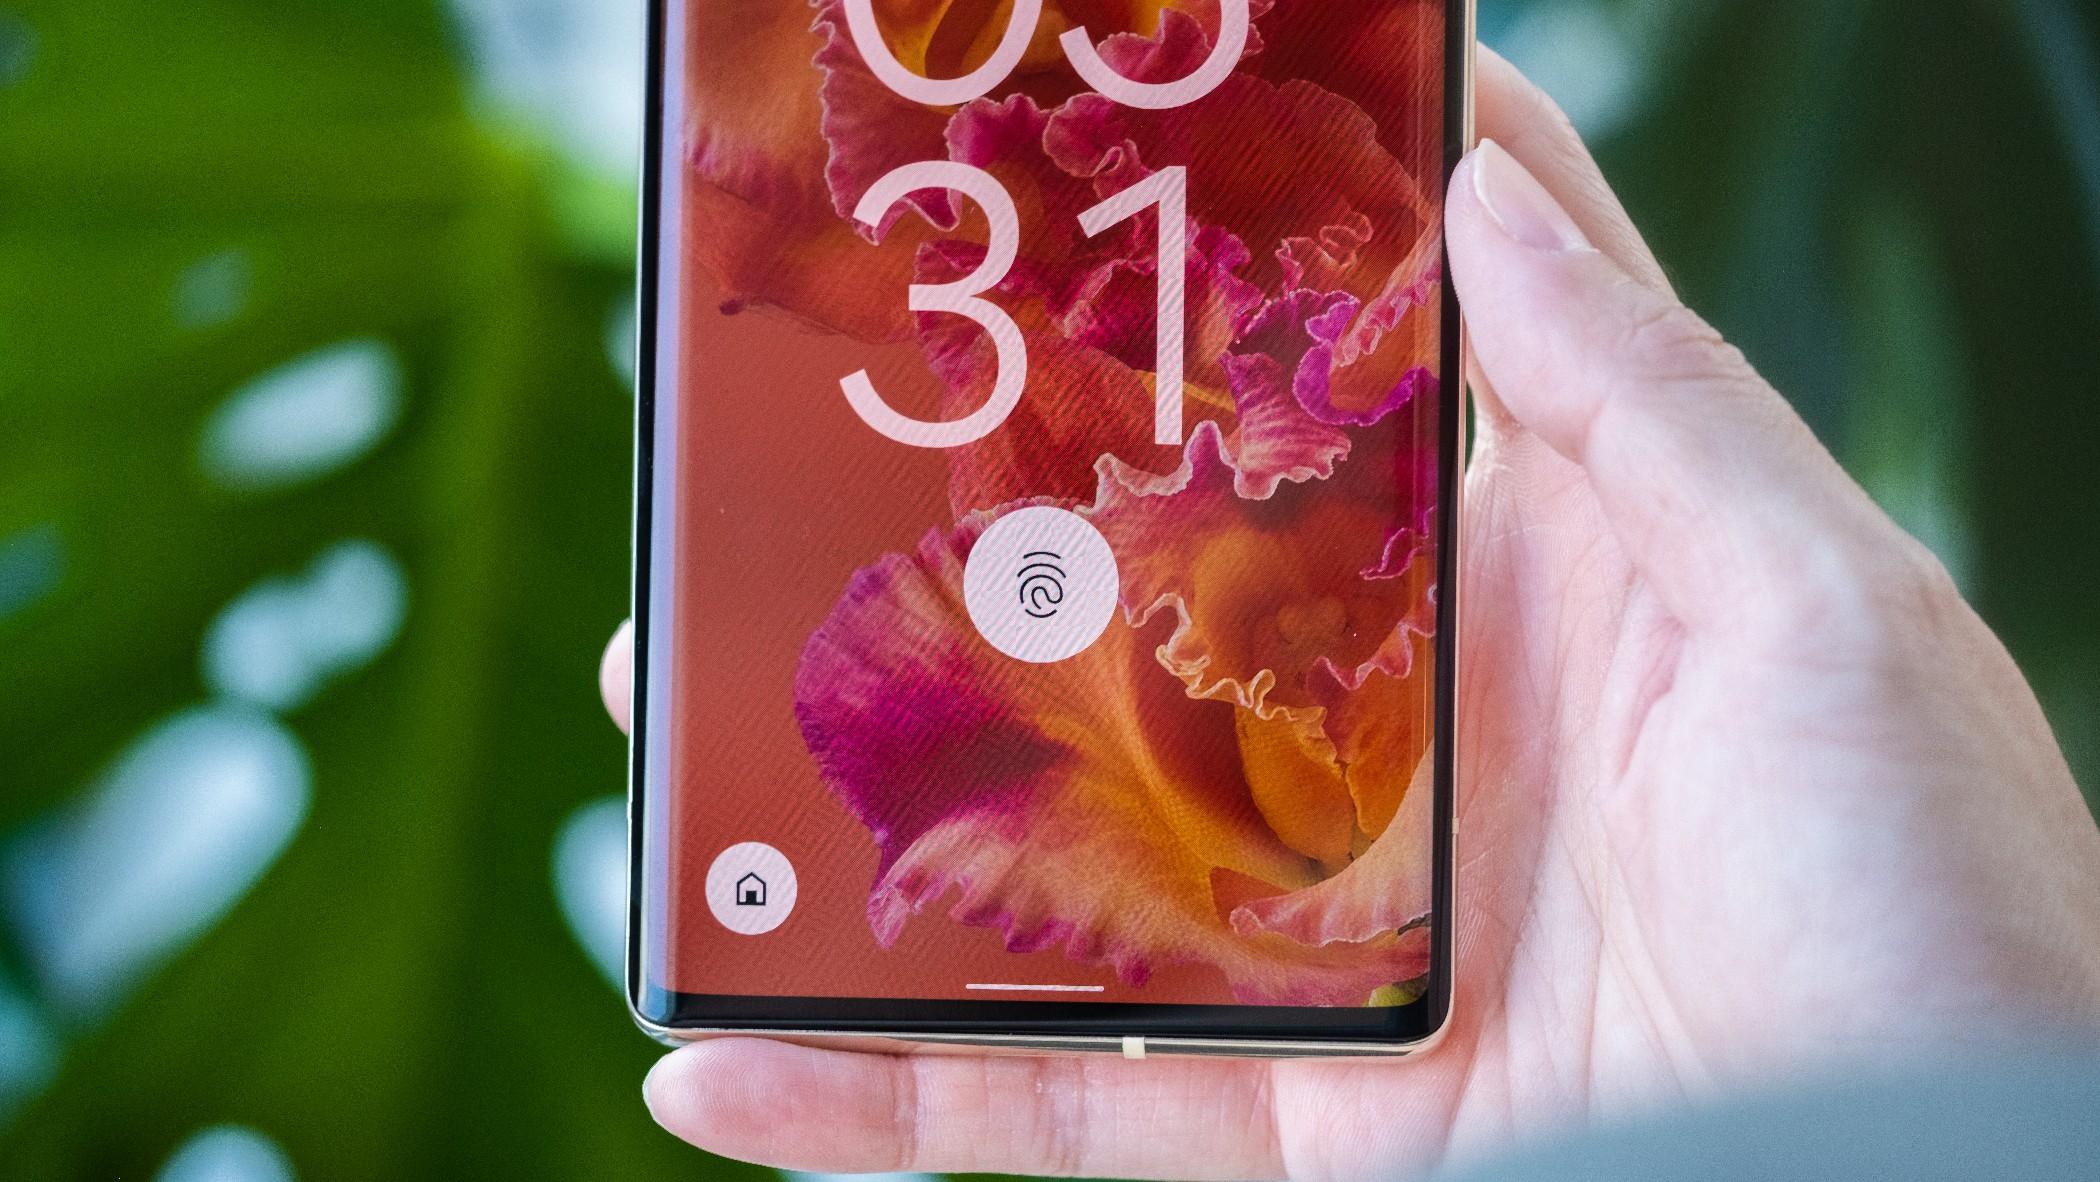 A close up on the Pixel 6 Pro's in-display fingerprint sensor.